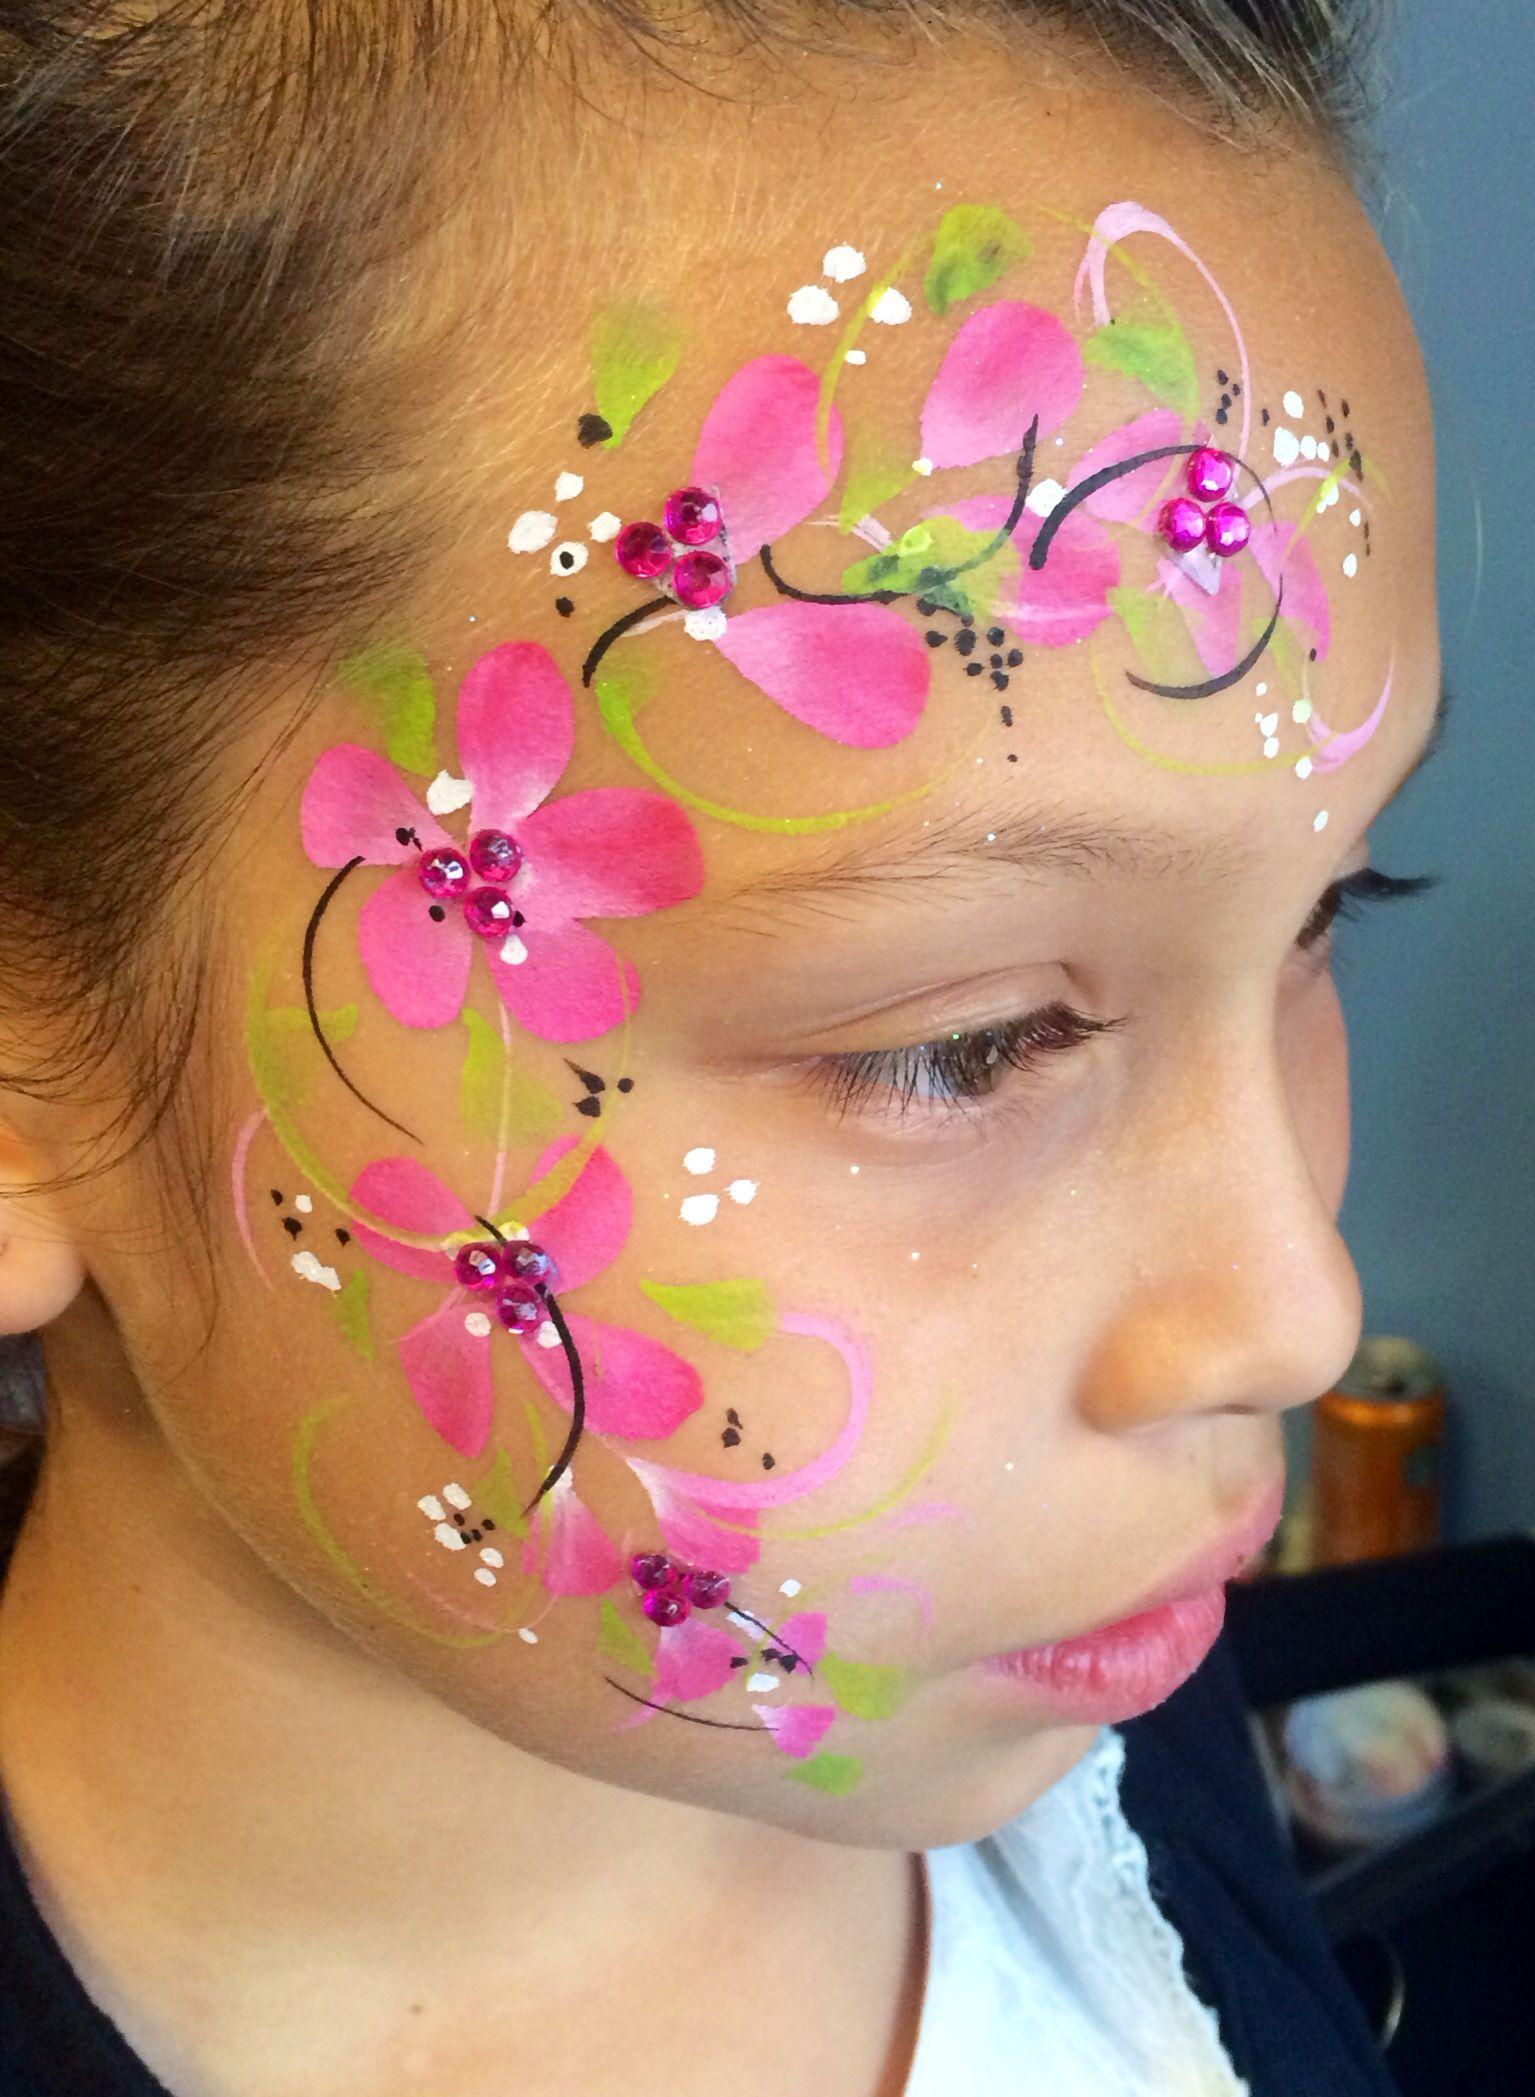 Face painting flowers | Face painting flowers, Girl face ...